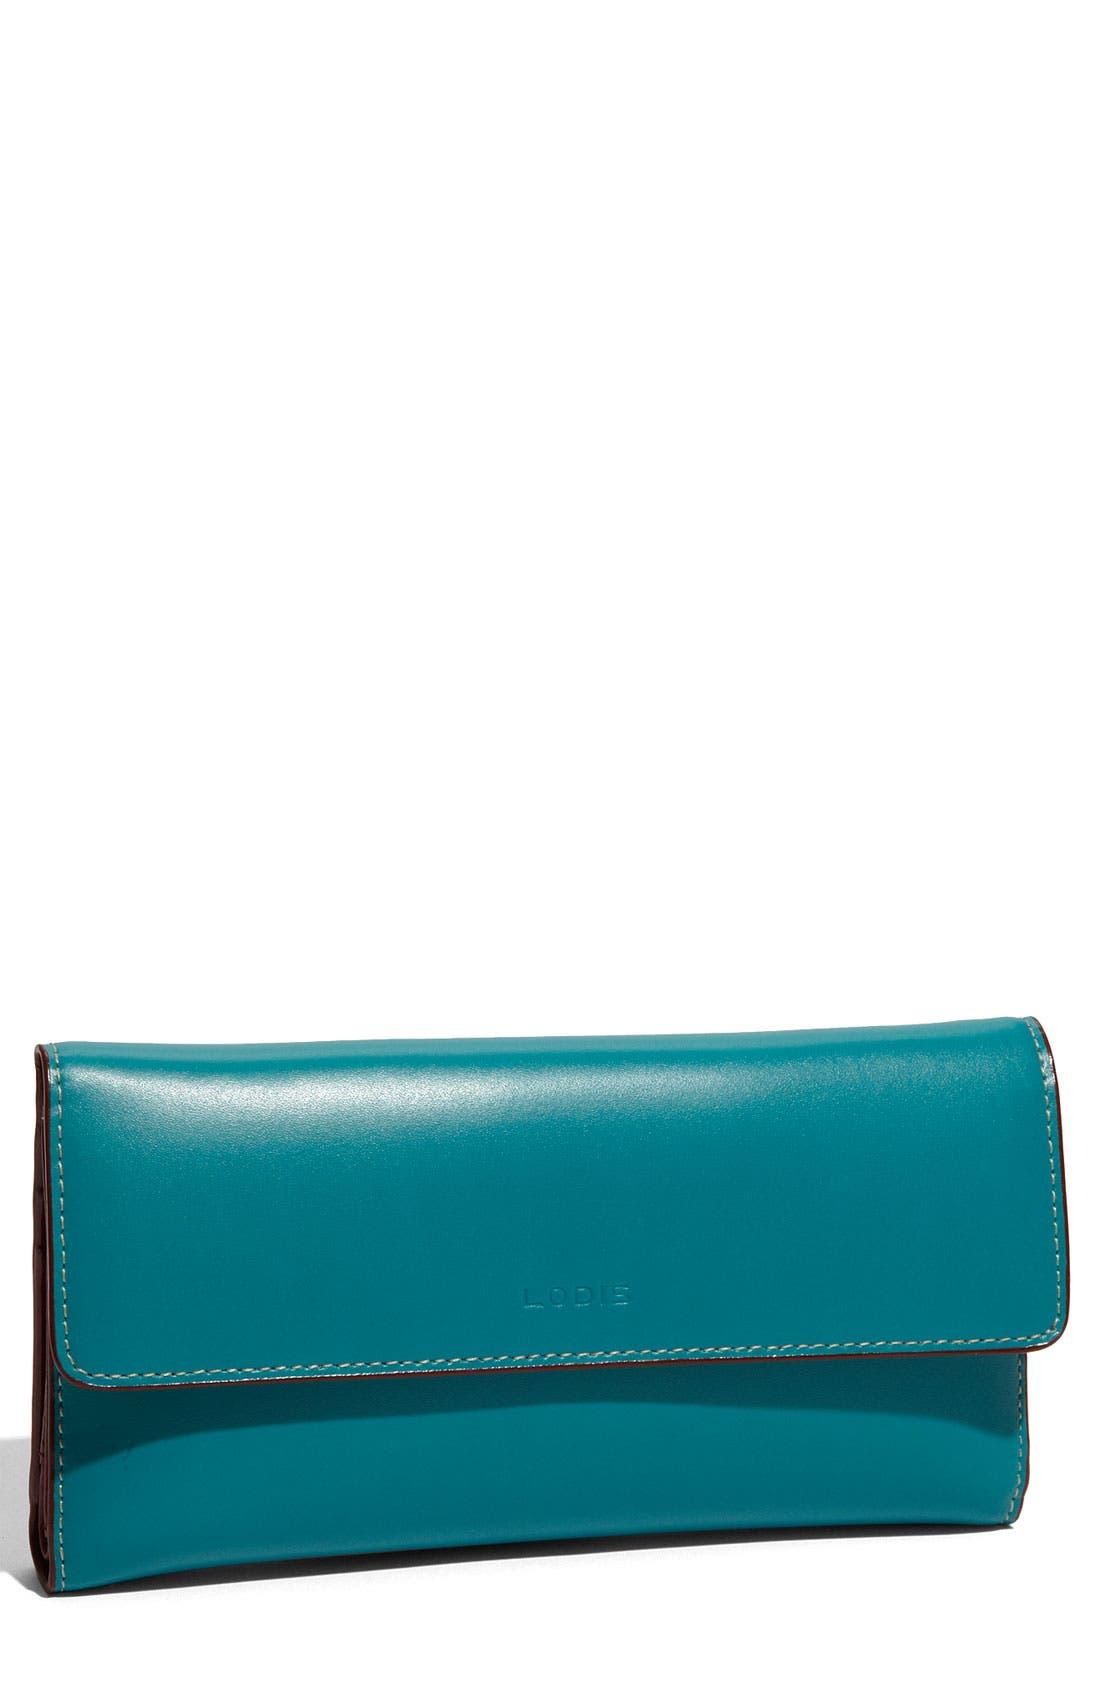 Lodis 'Audrey' Checkbook Clutch Wallet,                         Main,                         color, Teal/ Merlot